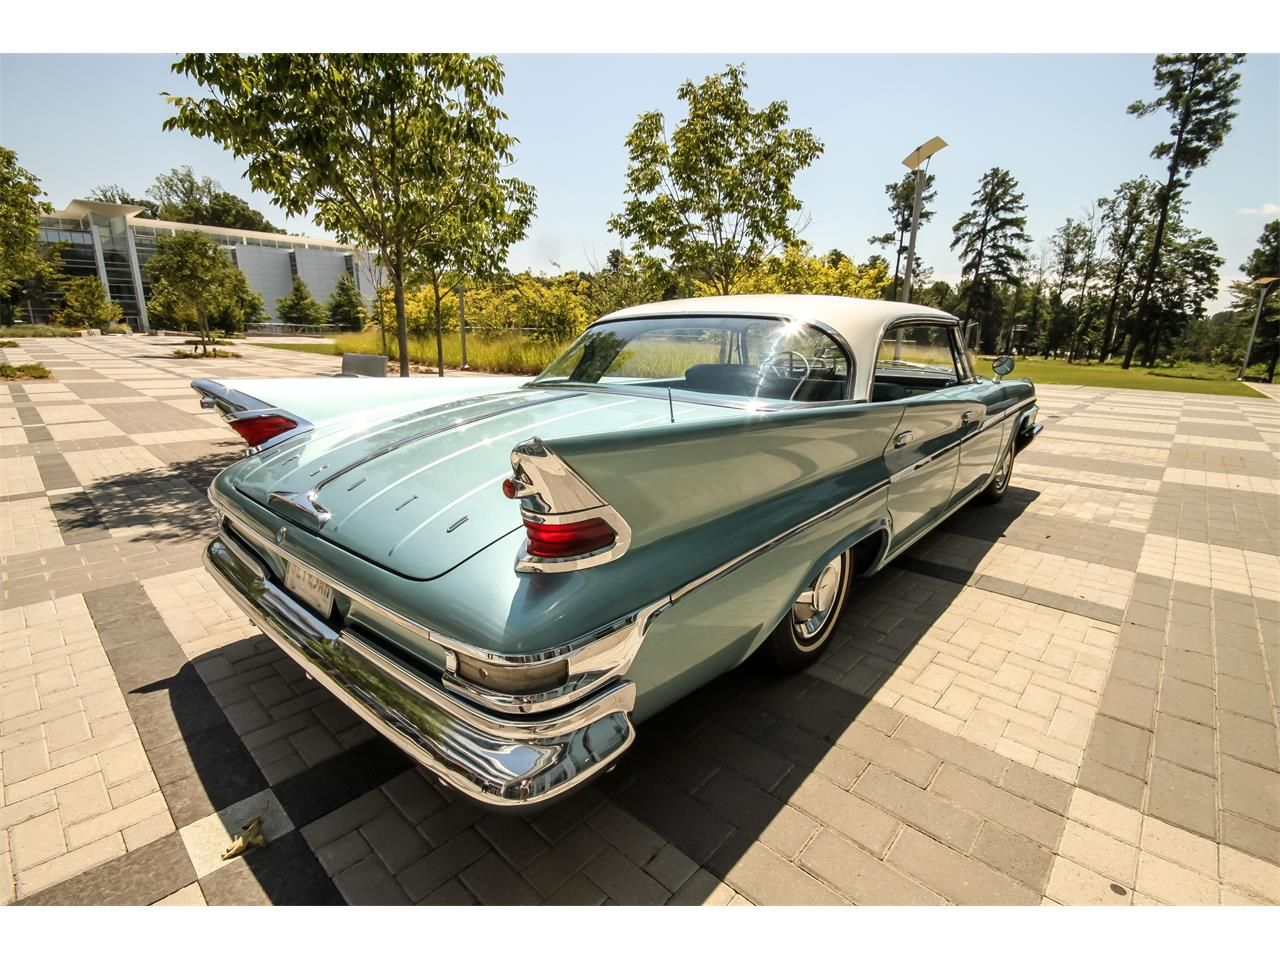 1961 DeSoto Vintage cars, Classic cars trucks, Classic cars